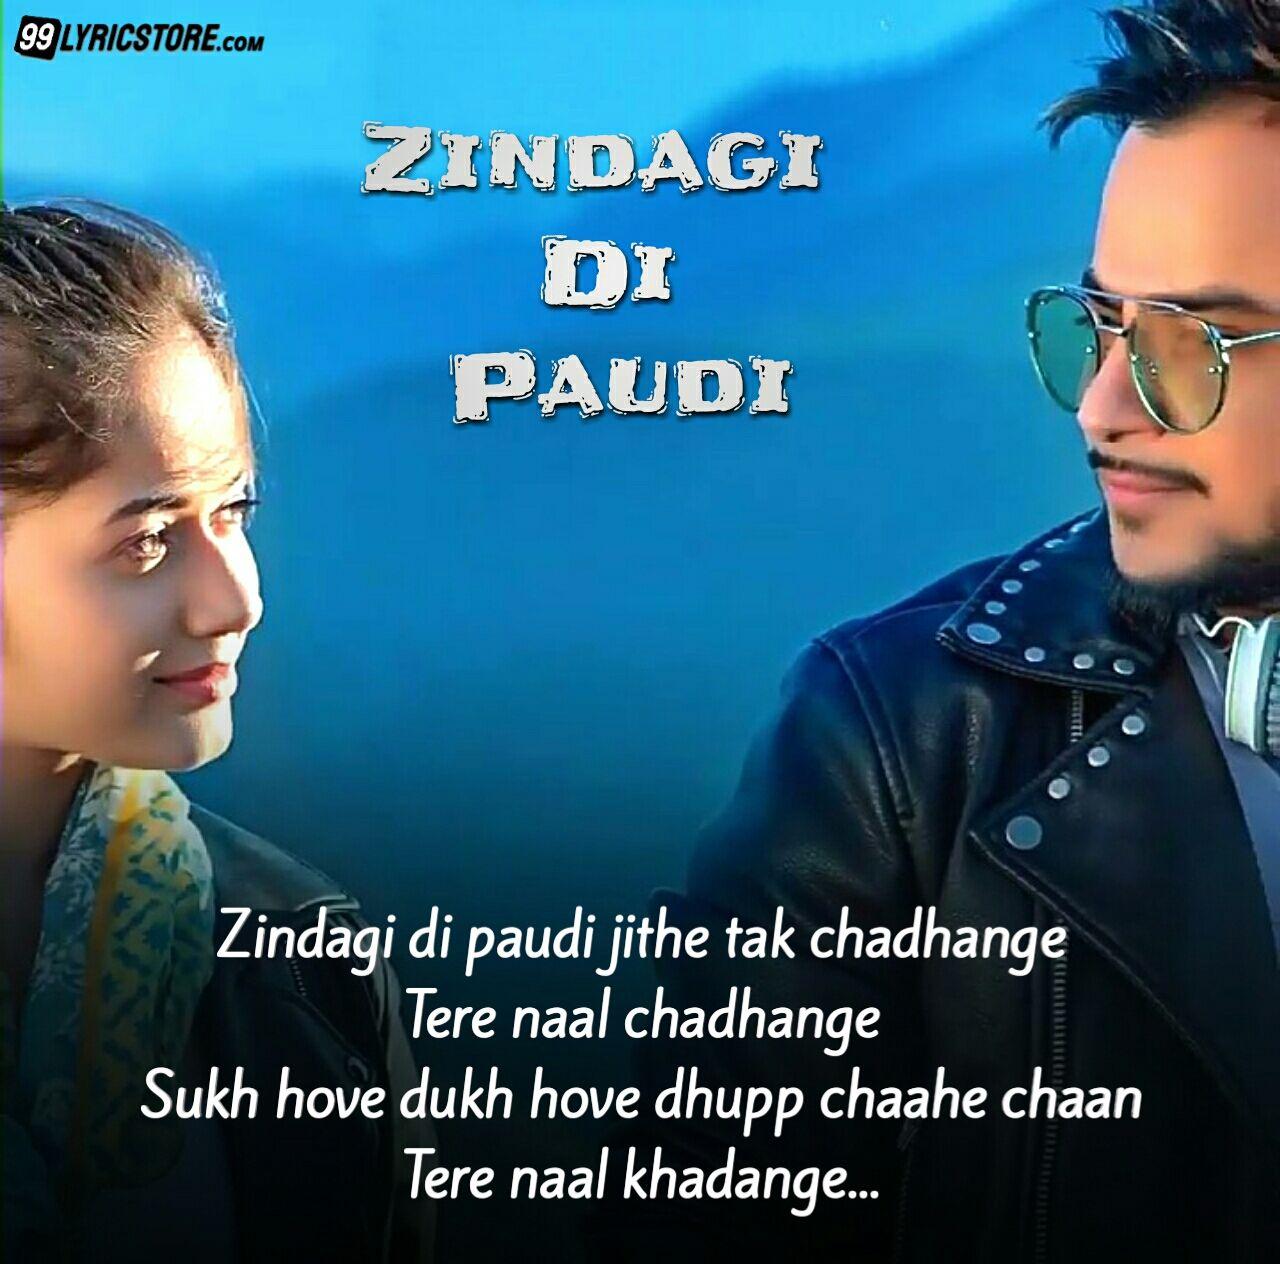 Zindagi Di Paudi Punjabi Song Lyrics sung by Milind Gaba ft. Jannat Zubair